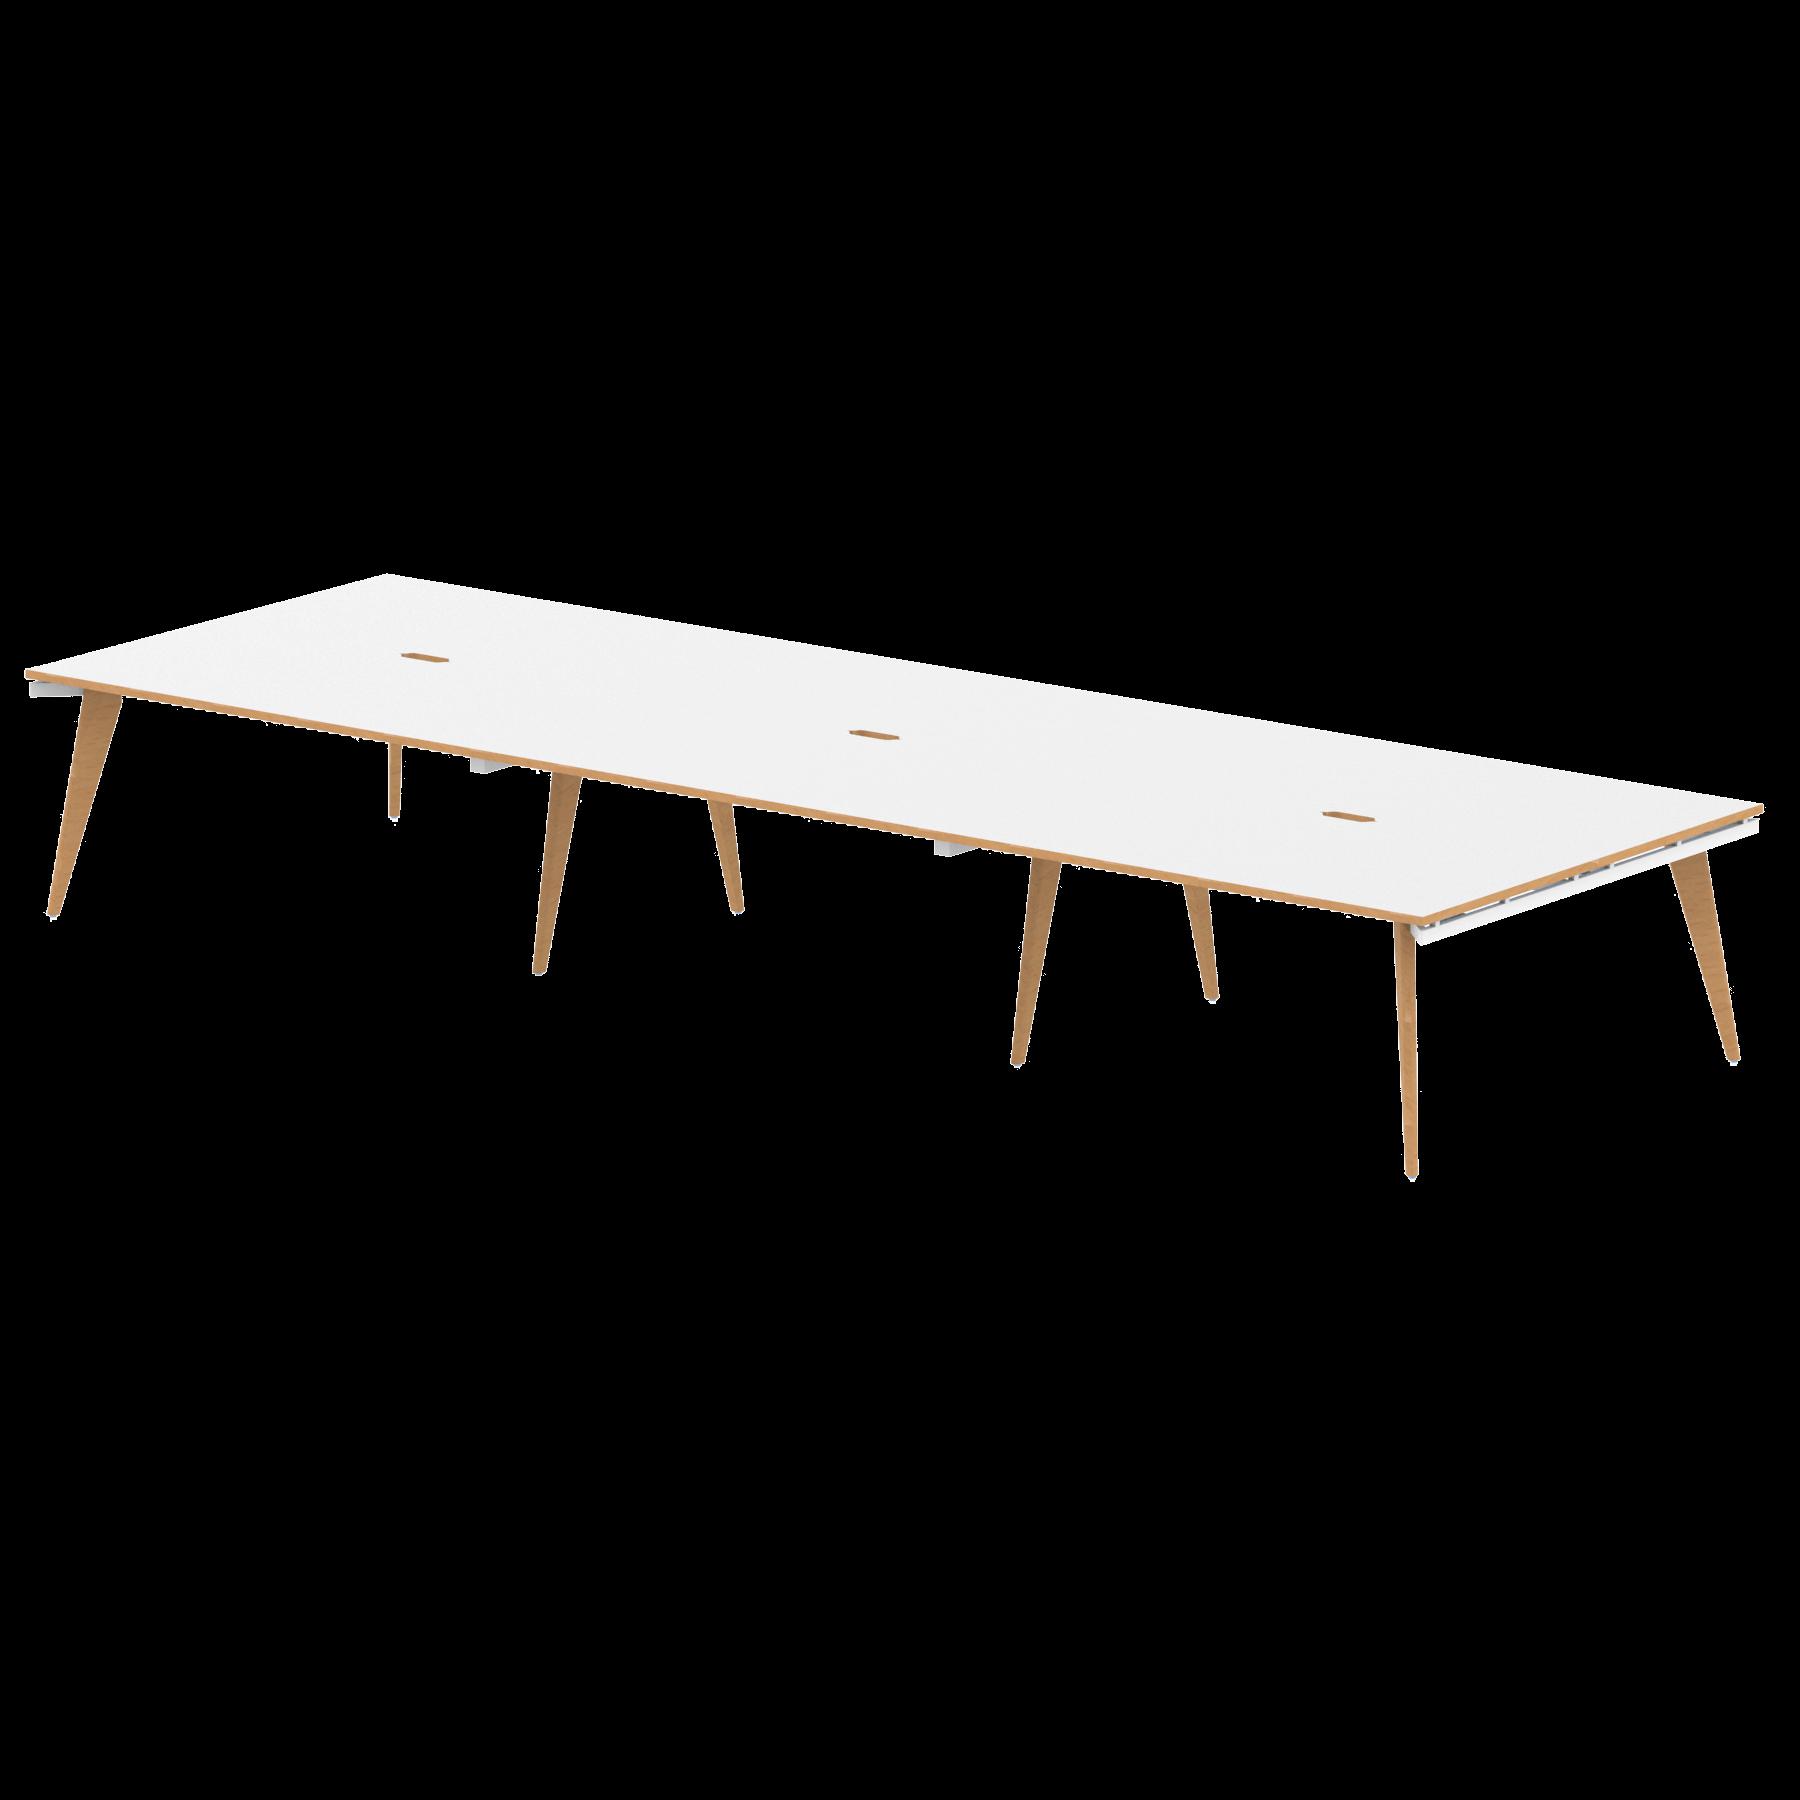 Oslo B2B White Frame Wooden Leg Bench Desk 1600 White With Natural Wood Edge (6 Pod)